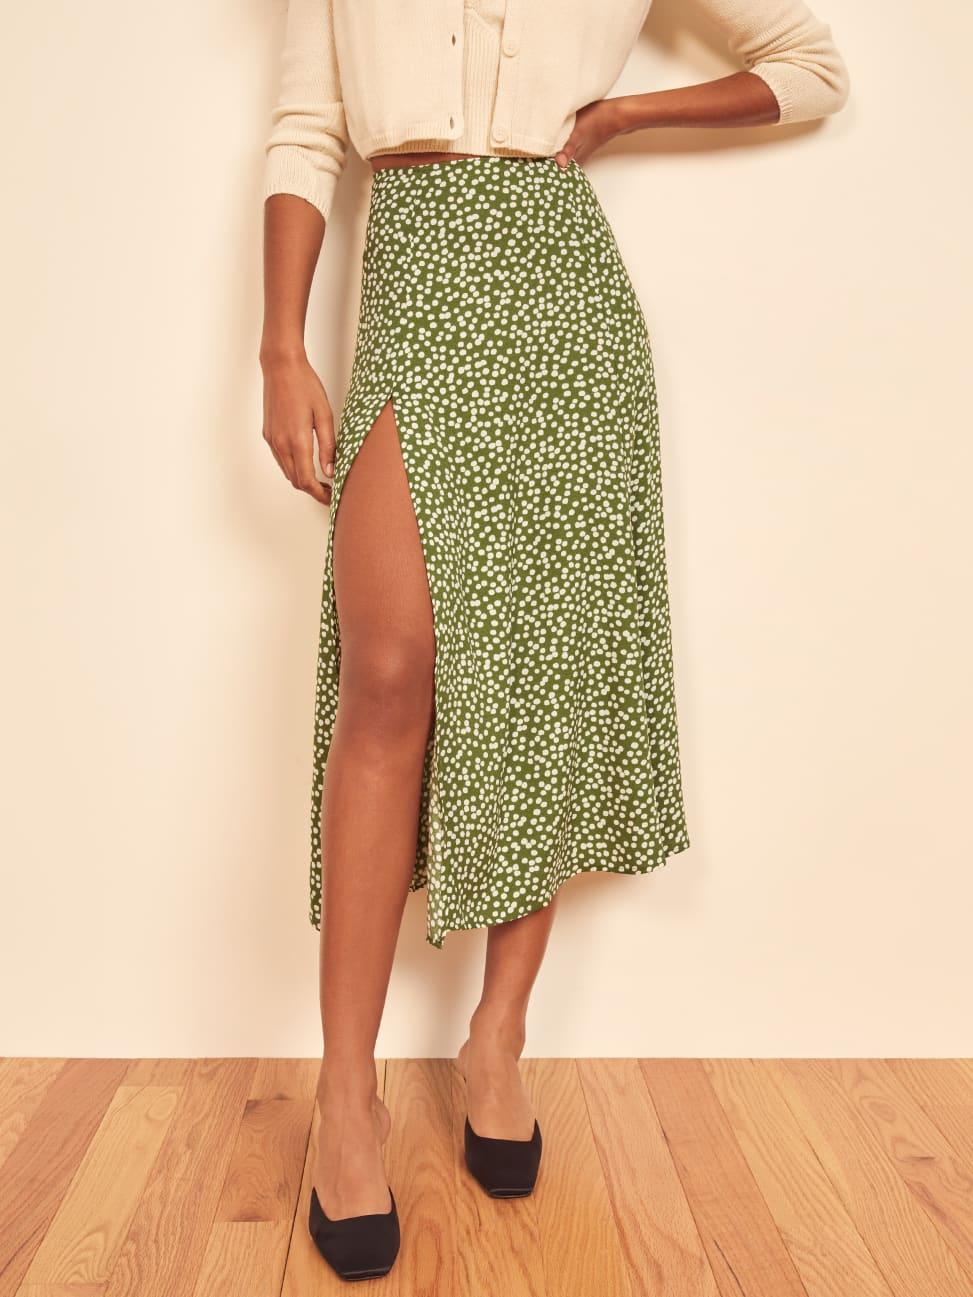 The Raiment Midi Skirt